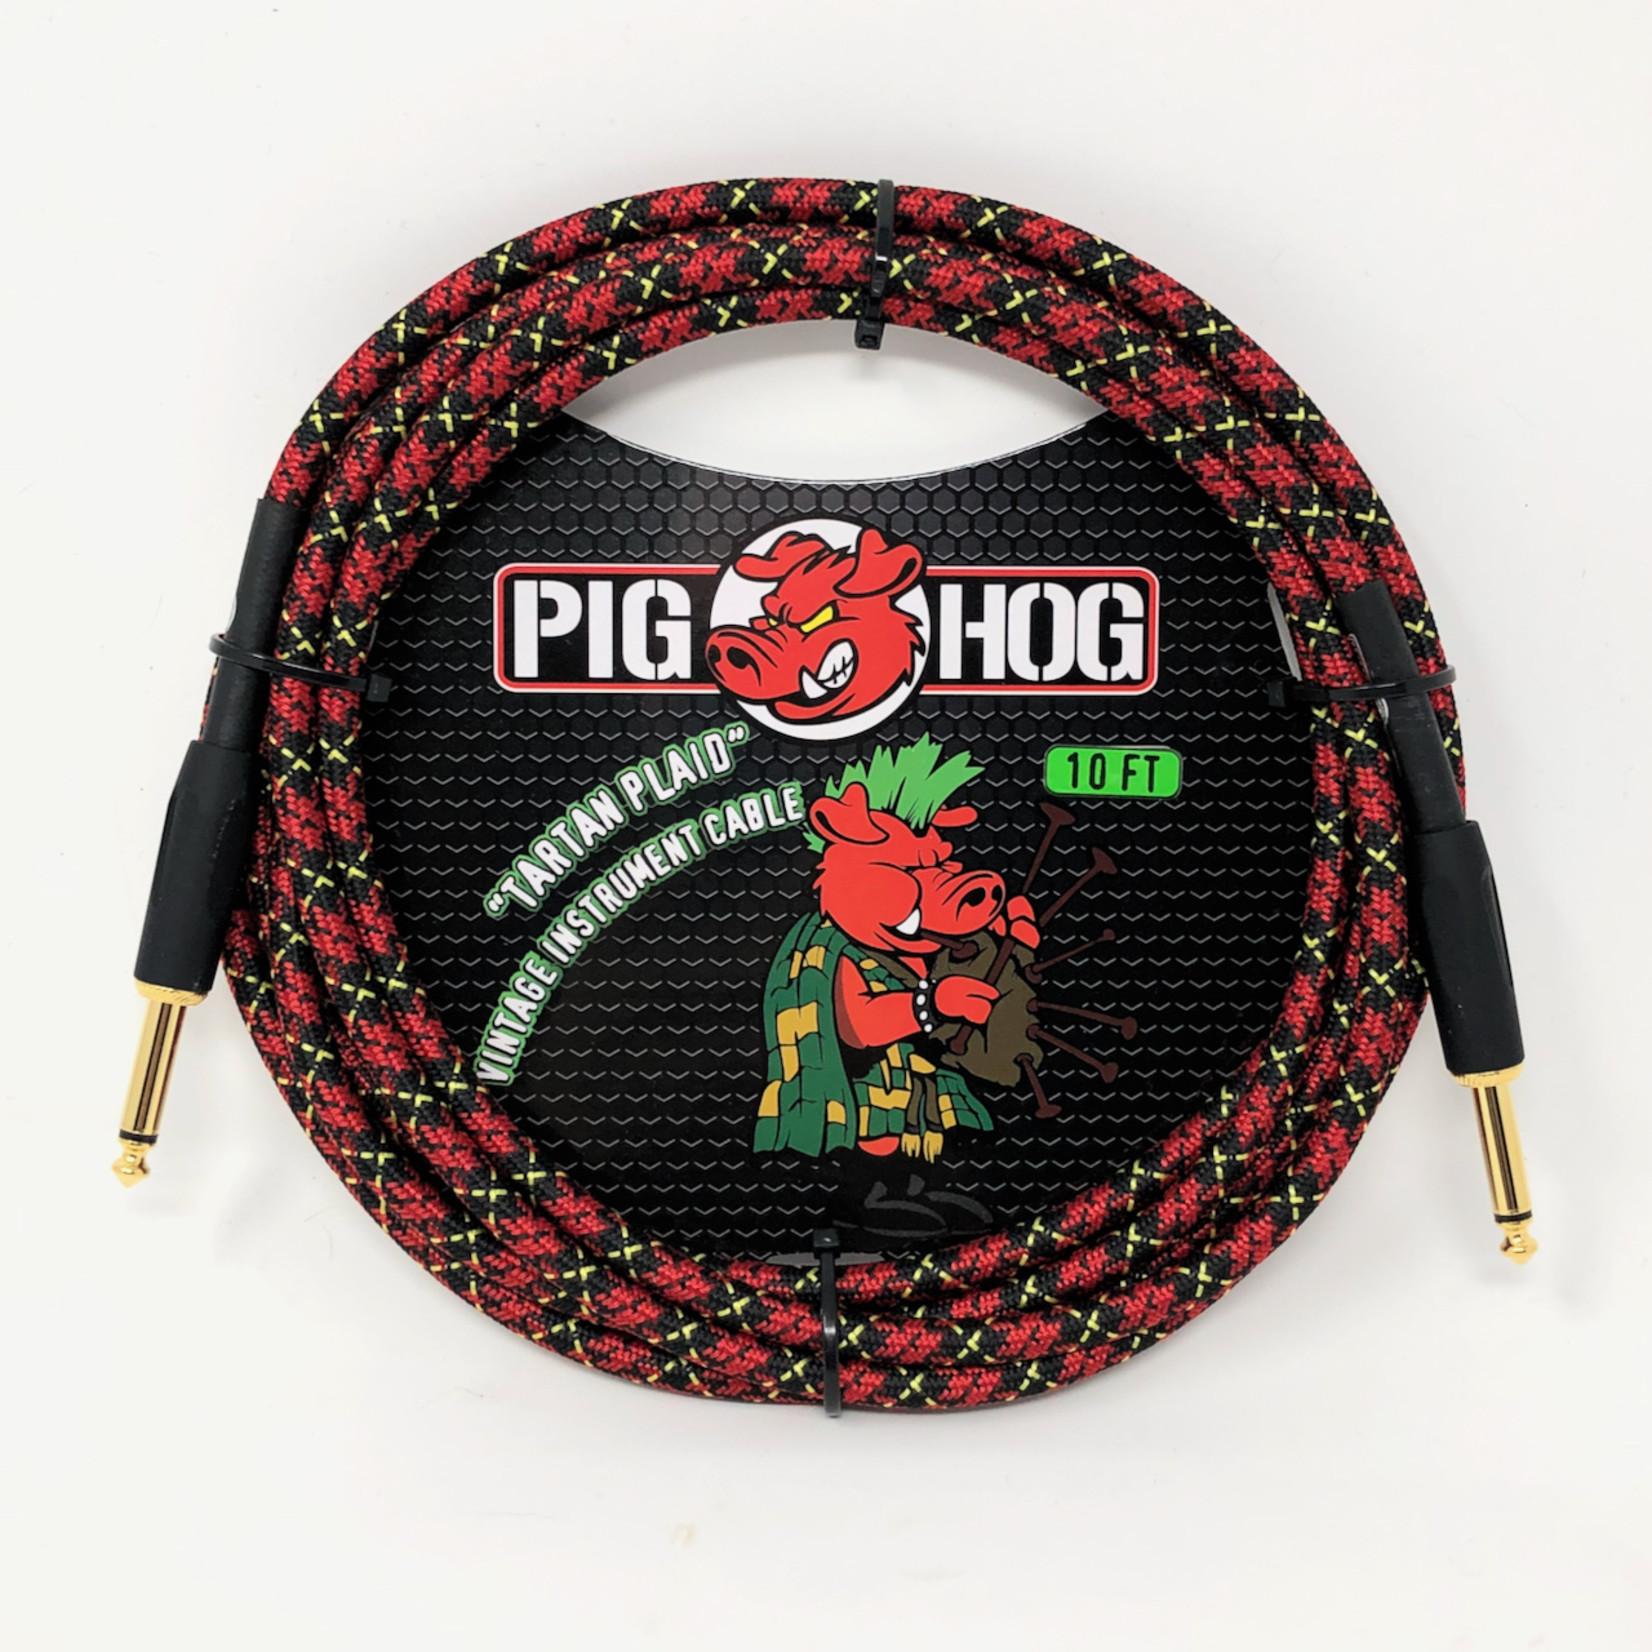 "Pig Hog Pig Hog ""Tartan Plaid"" Vintage Woven Instrument Cable - 10 FT Straight 1/4"" Plugs (PCH10PL)"